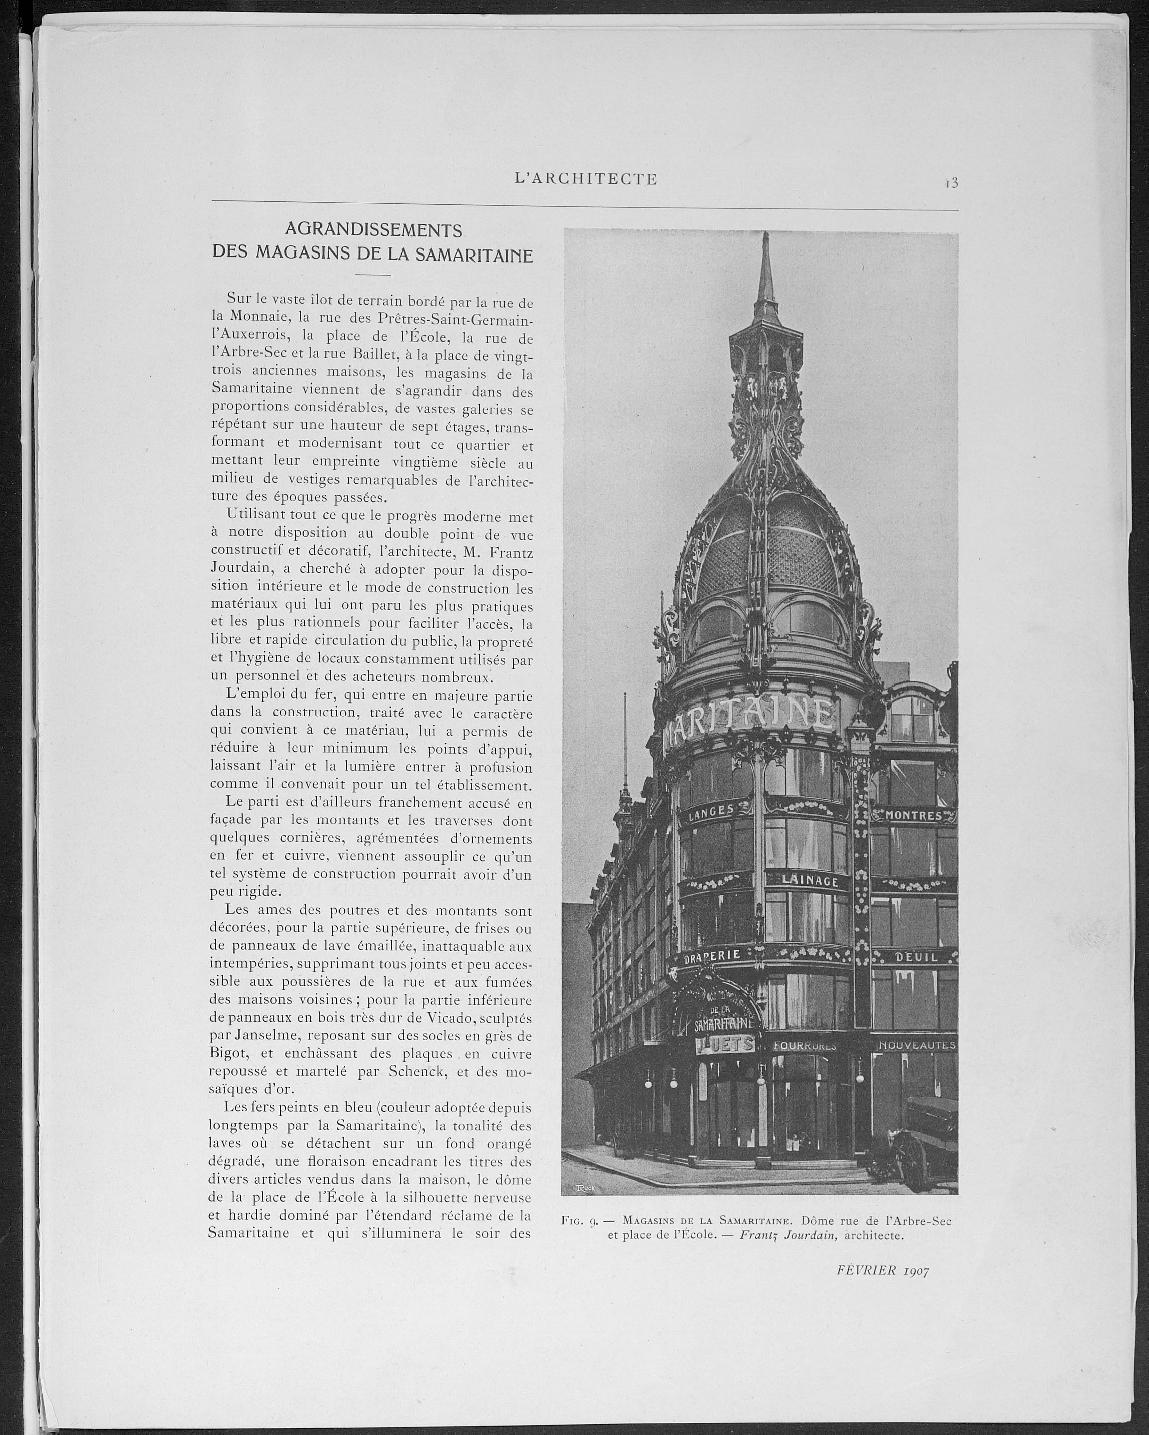 L'Architecte, no. 2, 1907 |